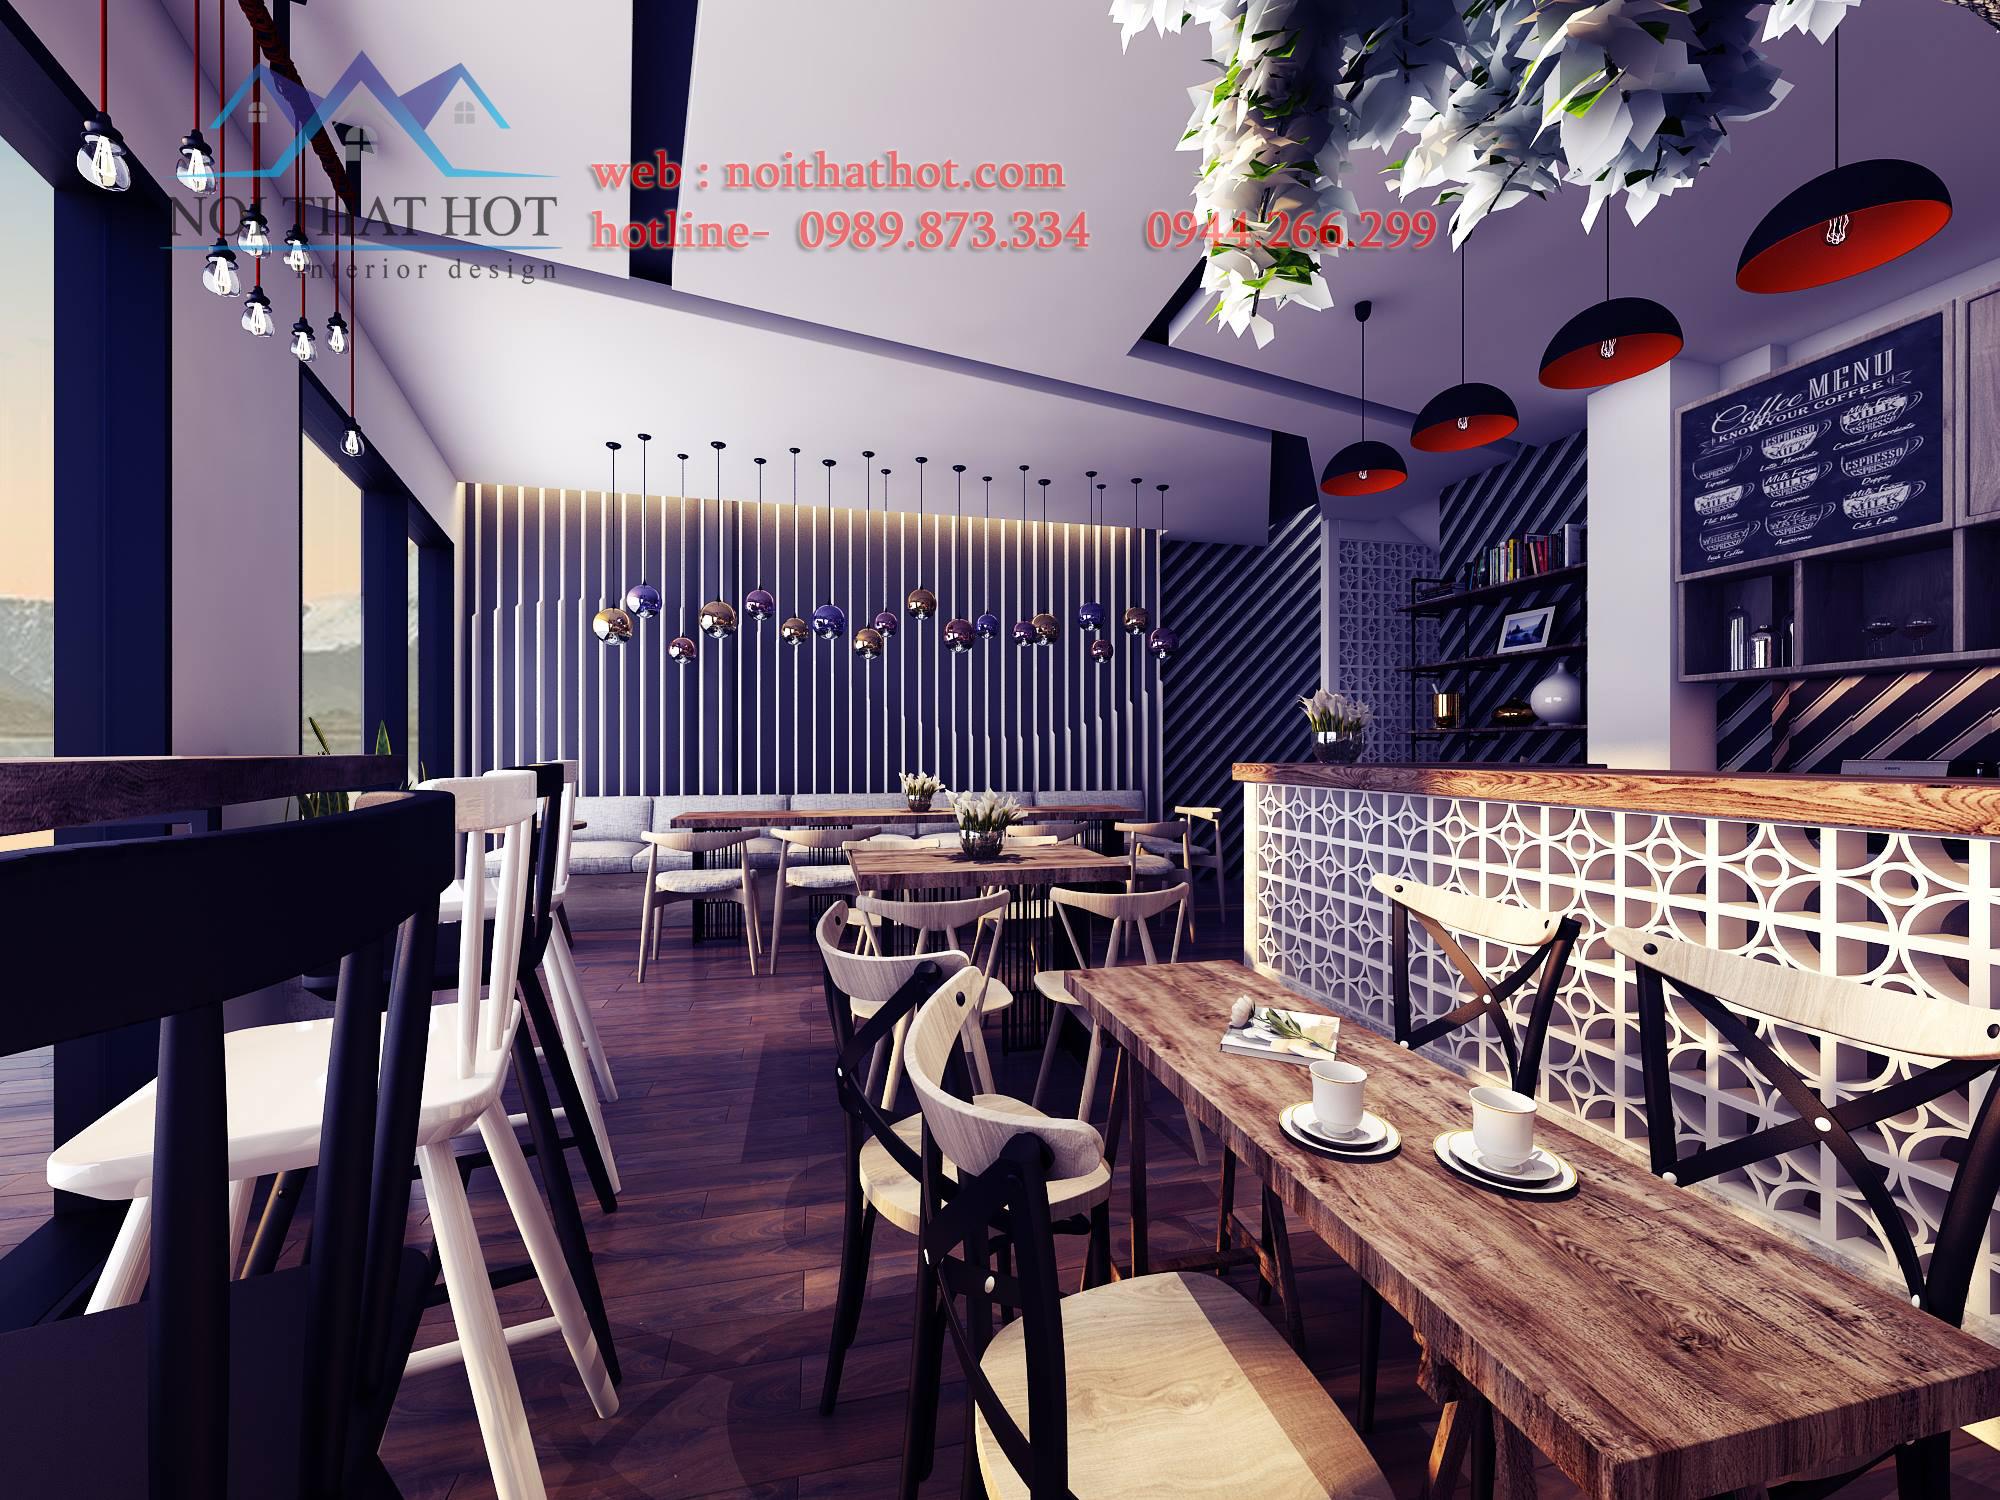 thiết kế quán cafe mộc dẹp mắt